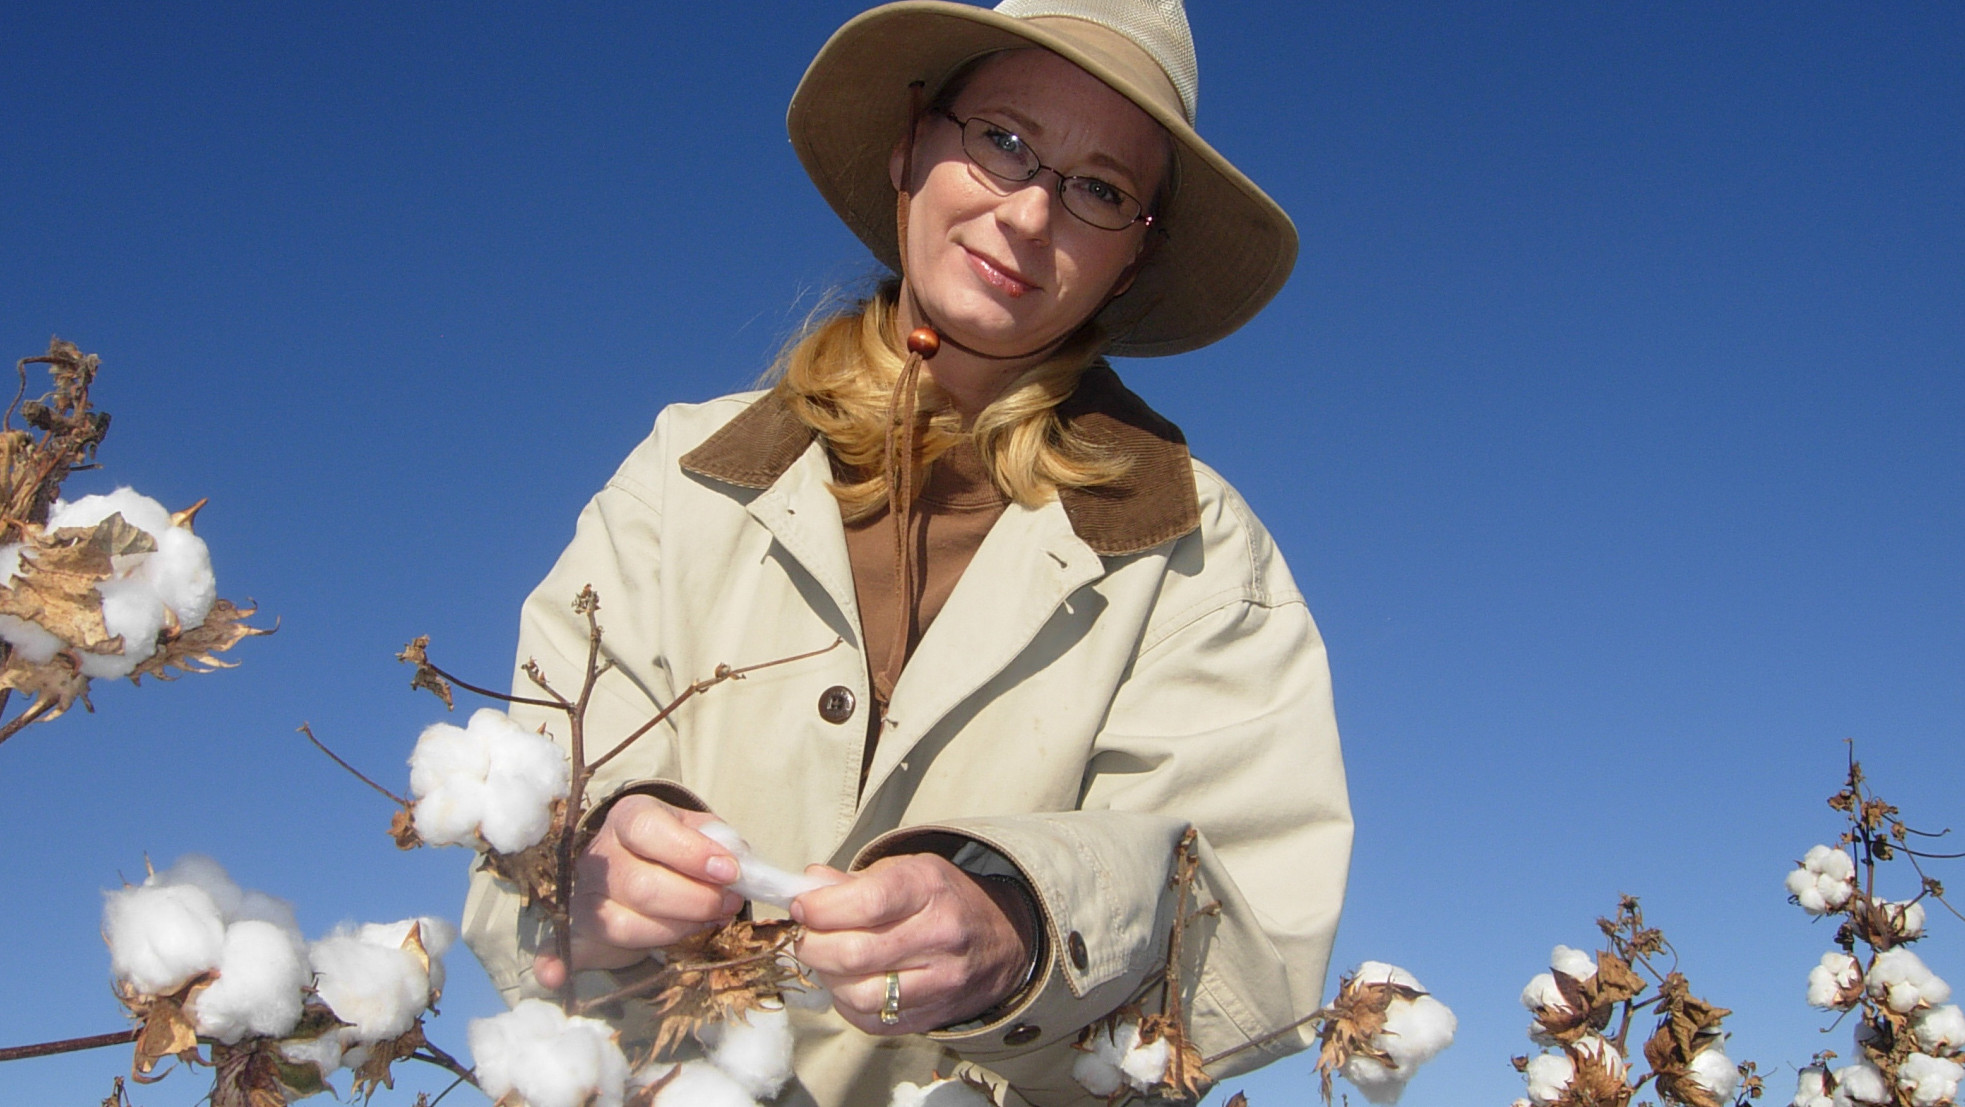 seed breeder